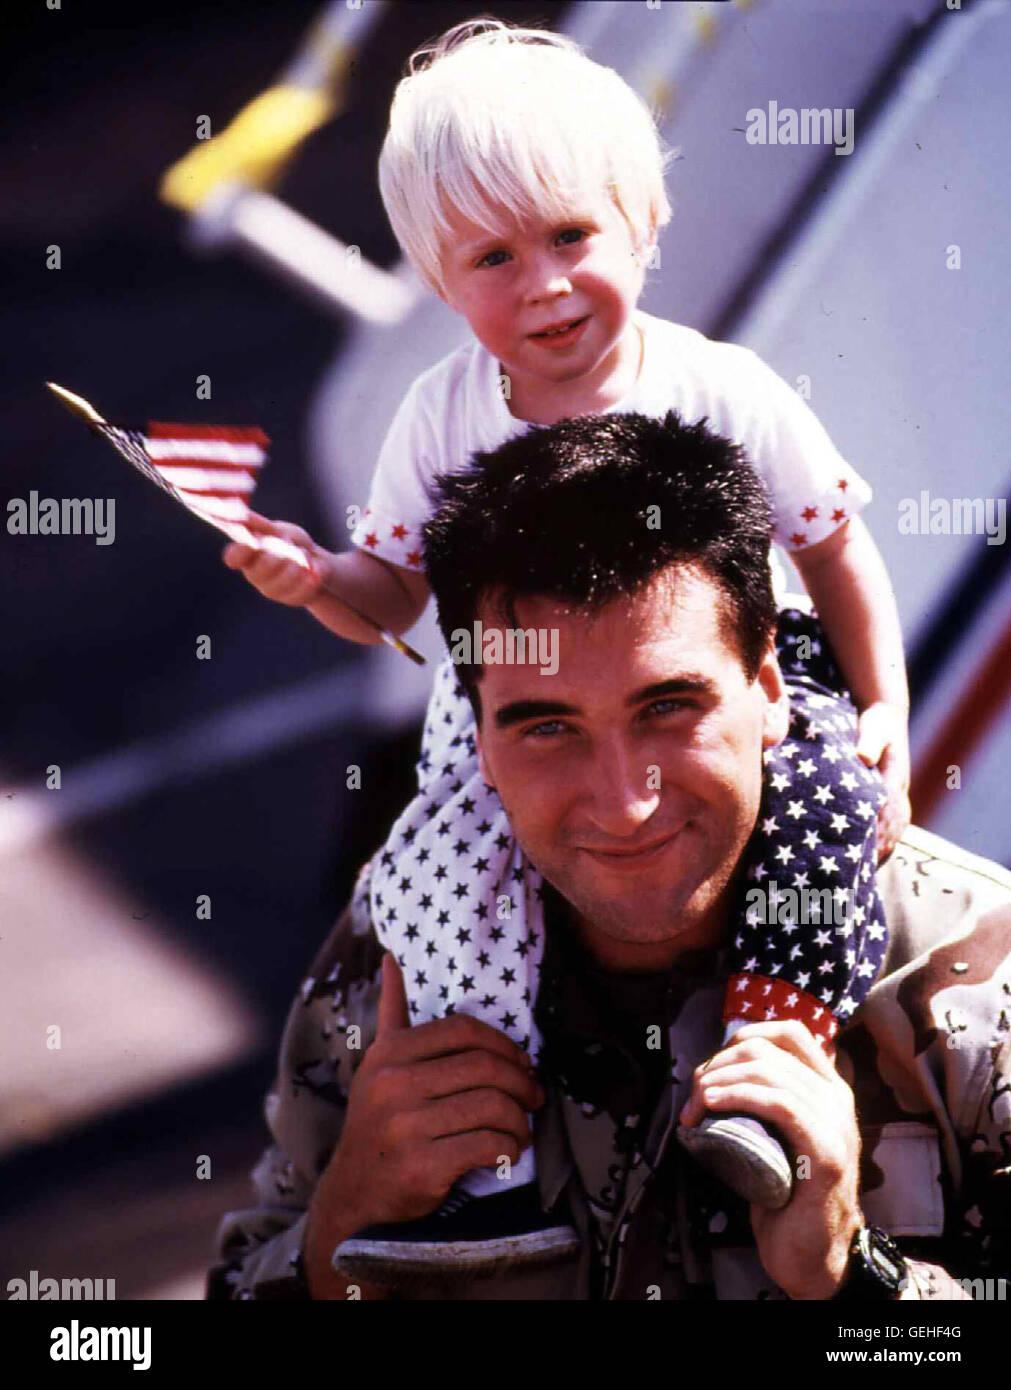 Sgt. Benjamin Pennington (Daniel Baldwin) *** Local Caption *** 1991, Heroes Of Desert Storm, The, Operation Wüstensturm - Stock Image